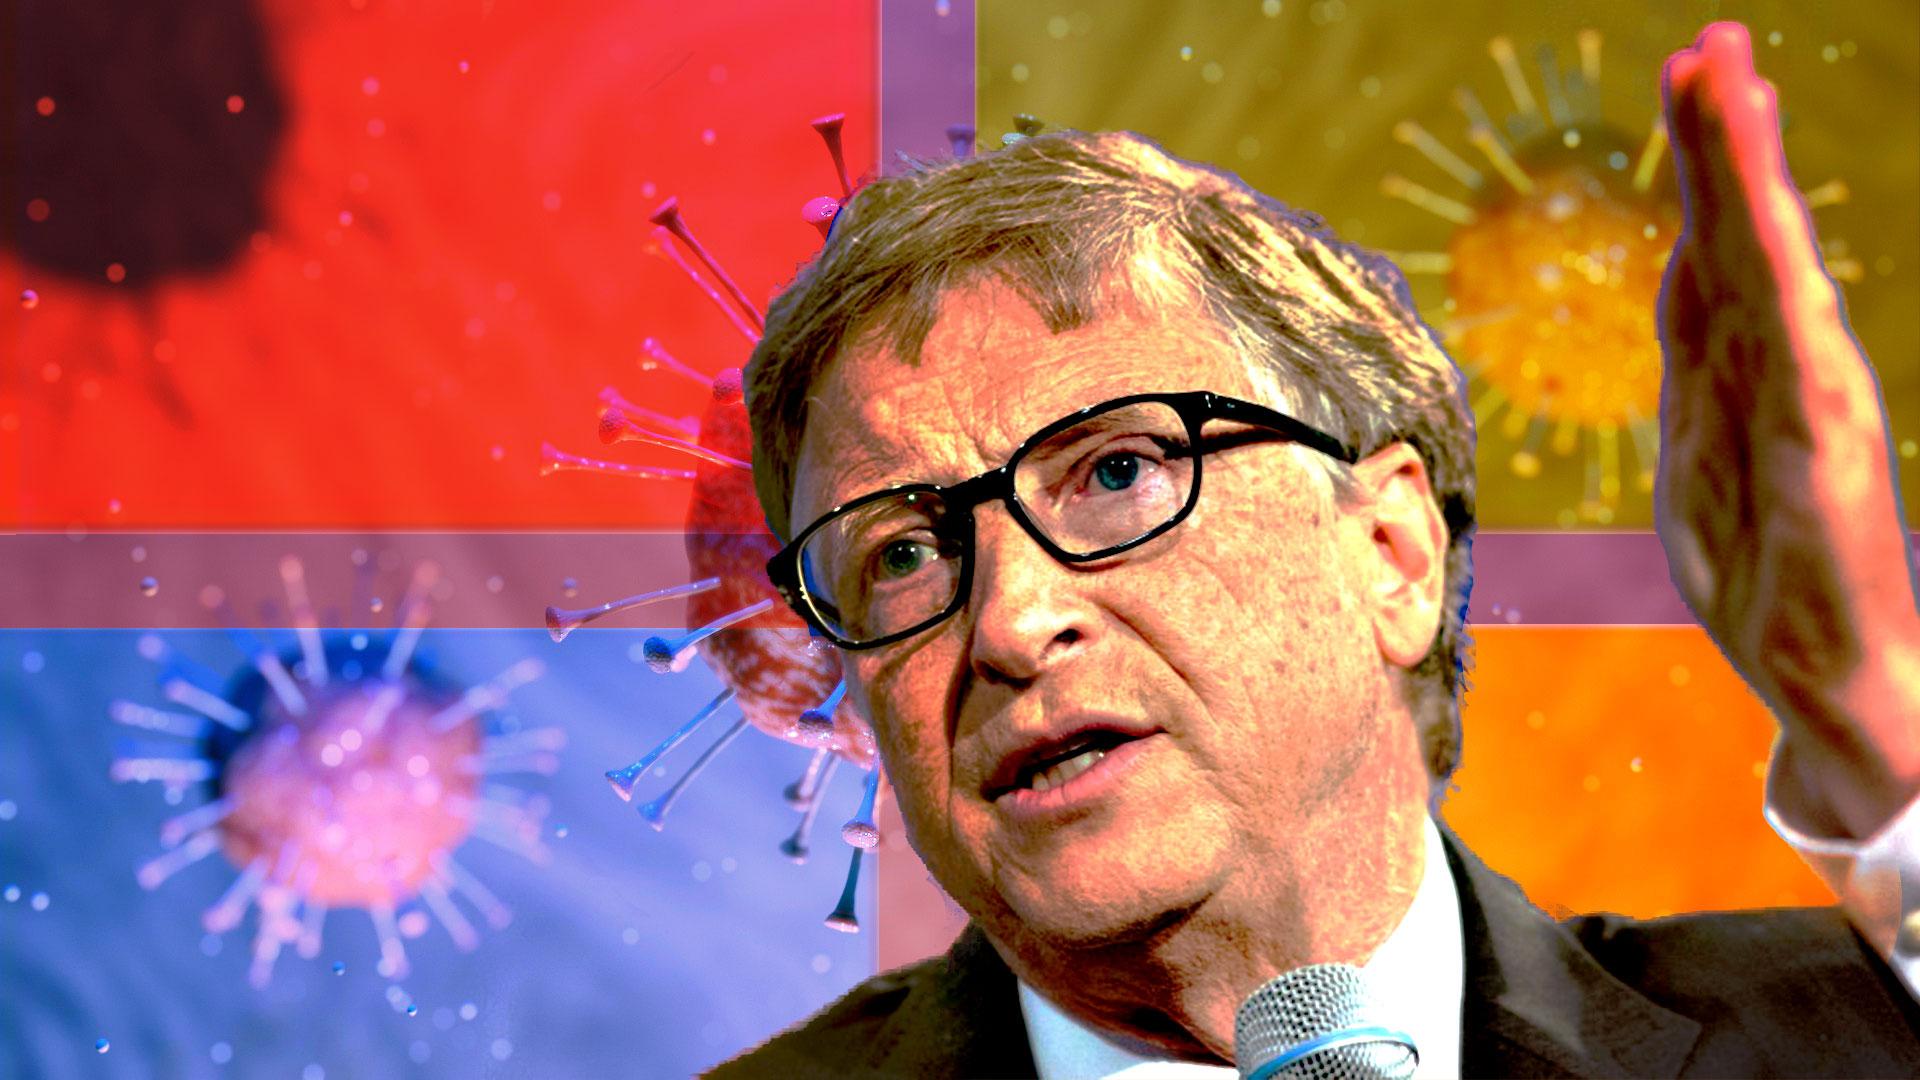 Microsoftの創業者ビル・ゲイツ氏「コロナワクチン開発は最短9カ月、最長2年となる可能性がある」